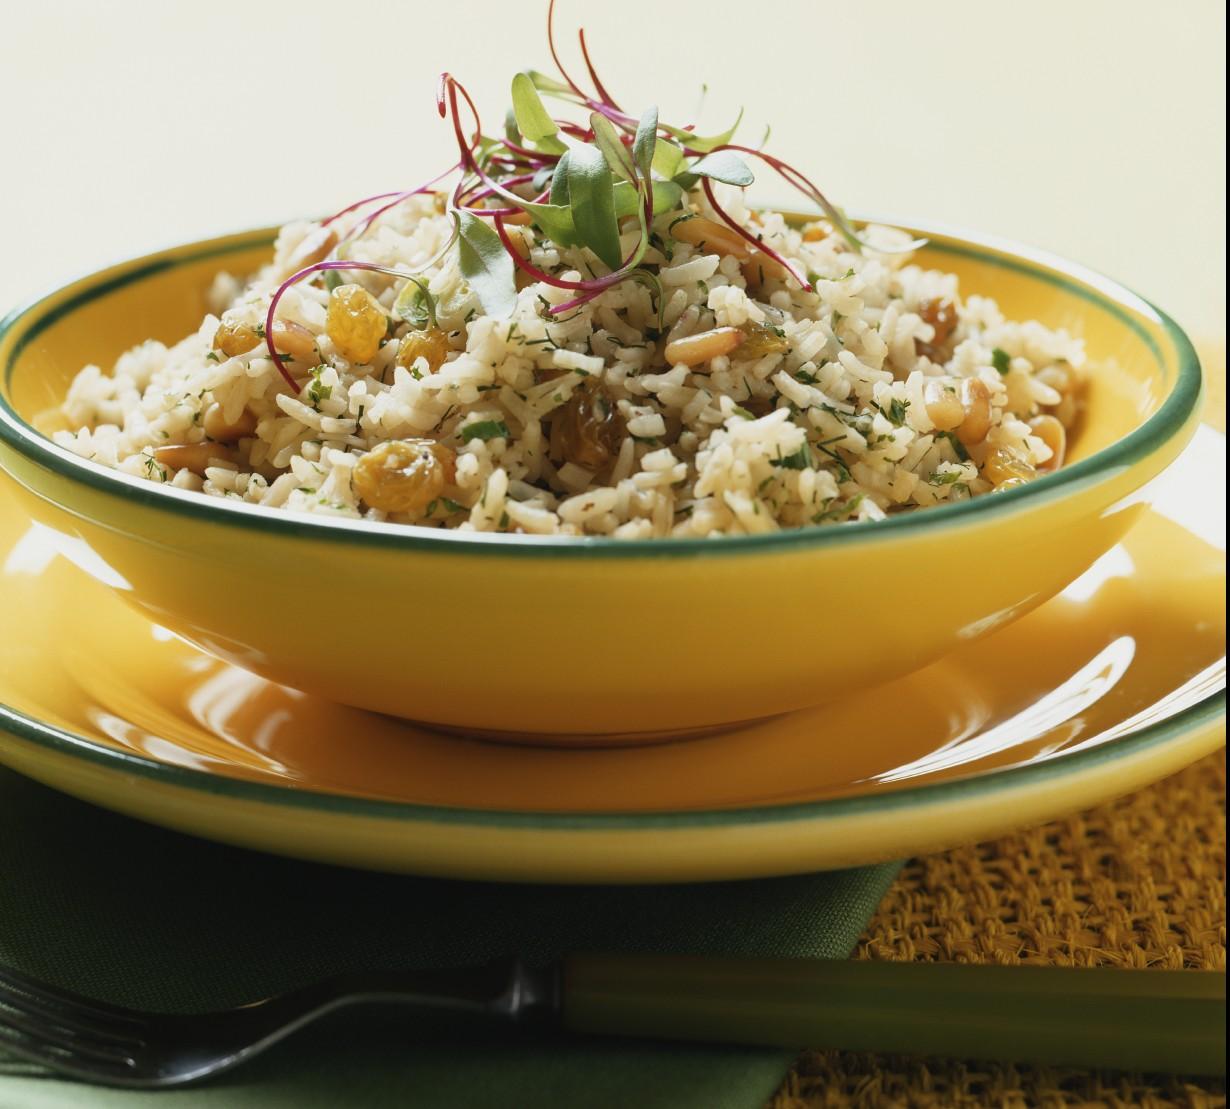 arroz-de-Natal-doutissima-istock-getty-images